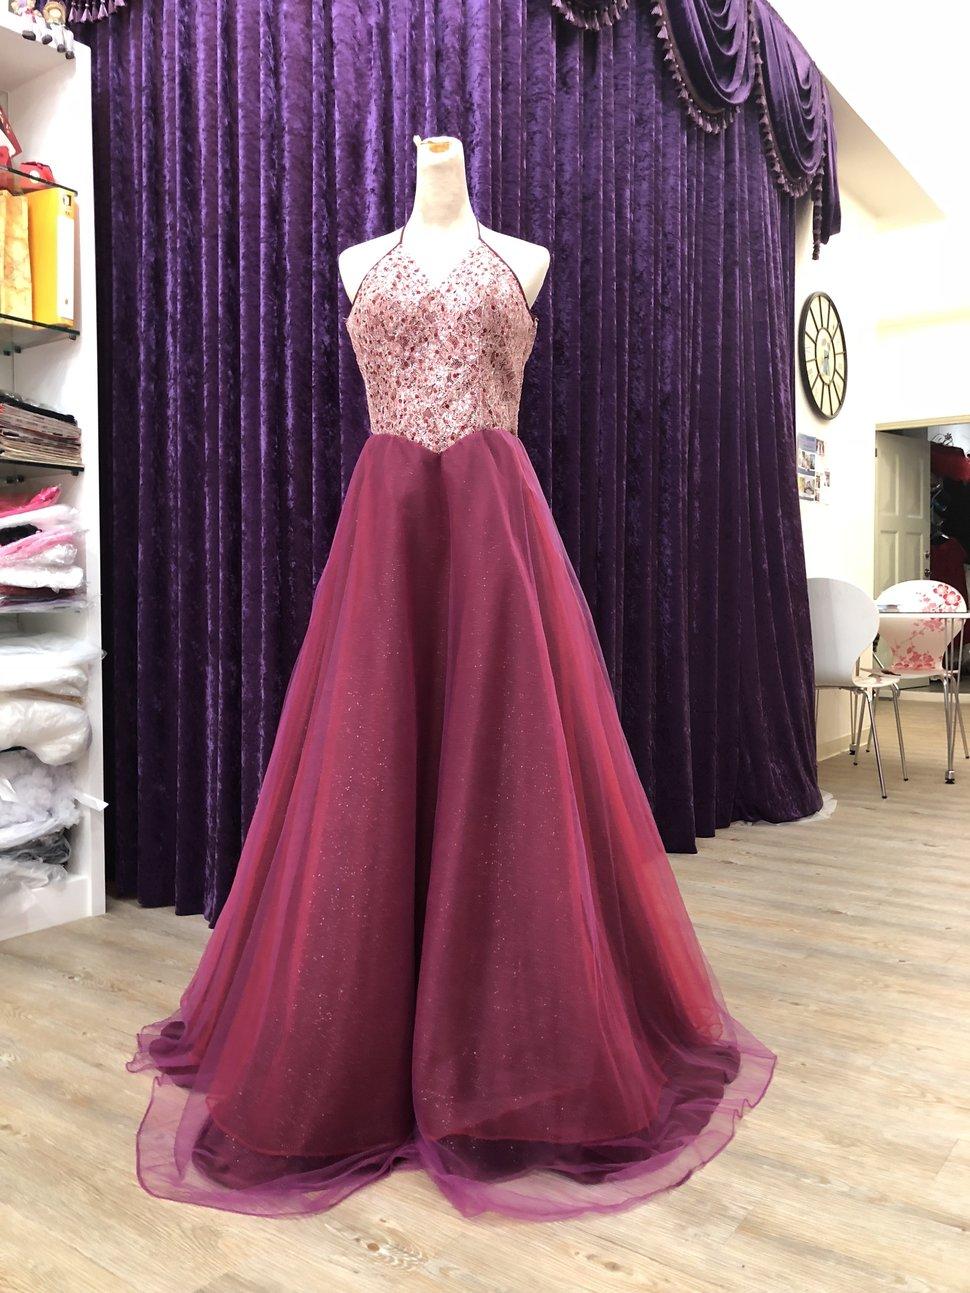 IMG_5235 - 全台最便宜-45DESIGN四五婚紗禮服《結婚吧》